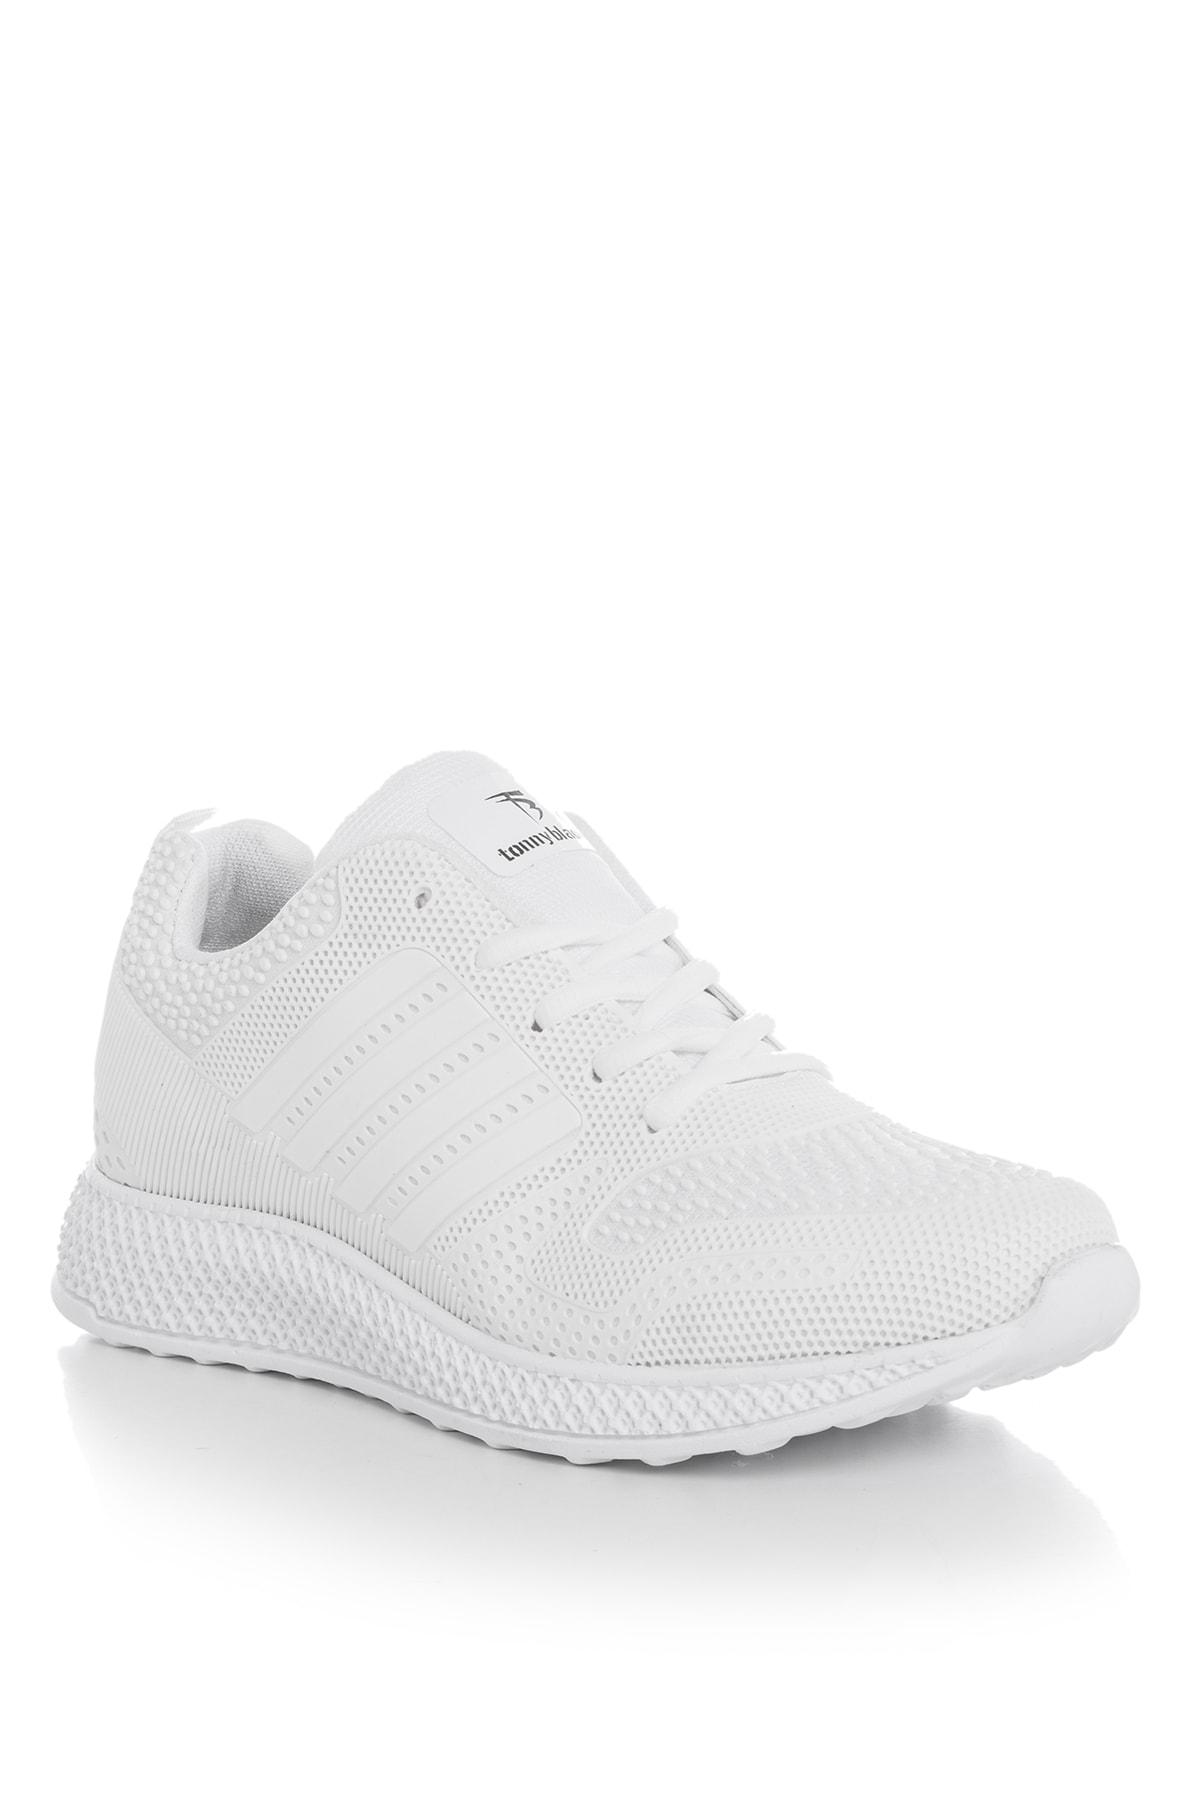 Tonny Black Beyaz Unisex Sneaker TB3006-0